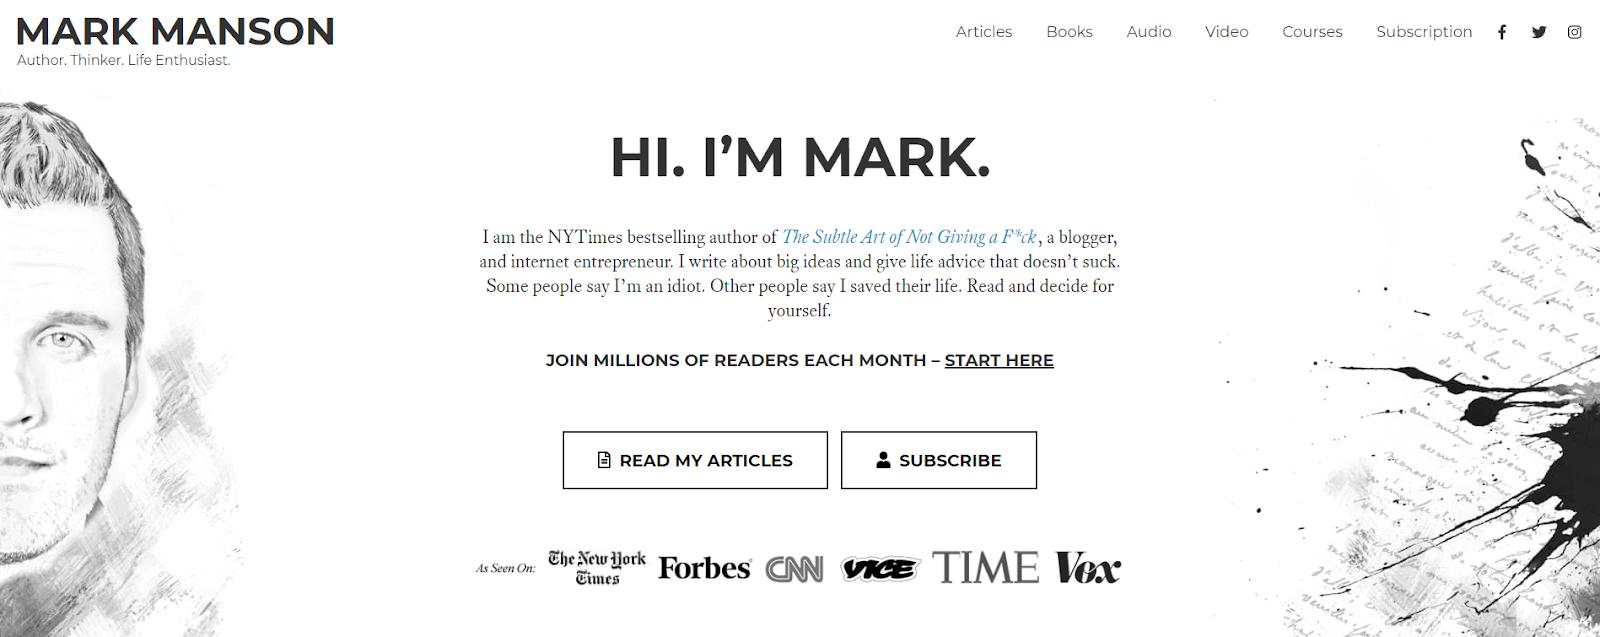 Mark Manson's personal website